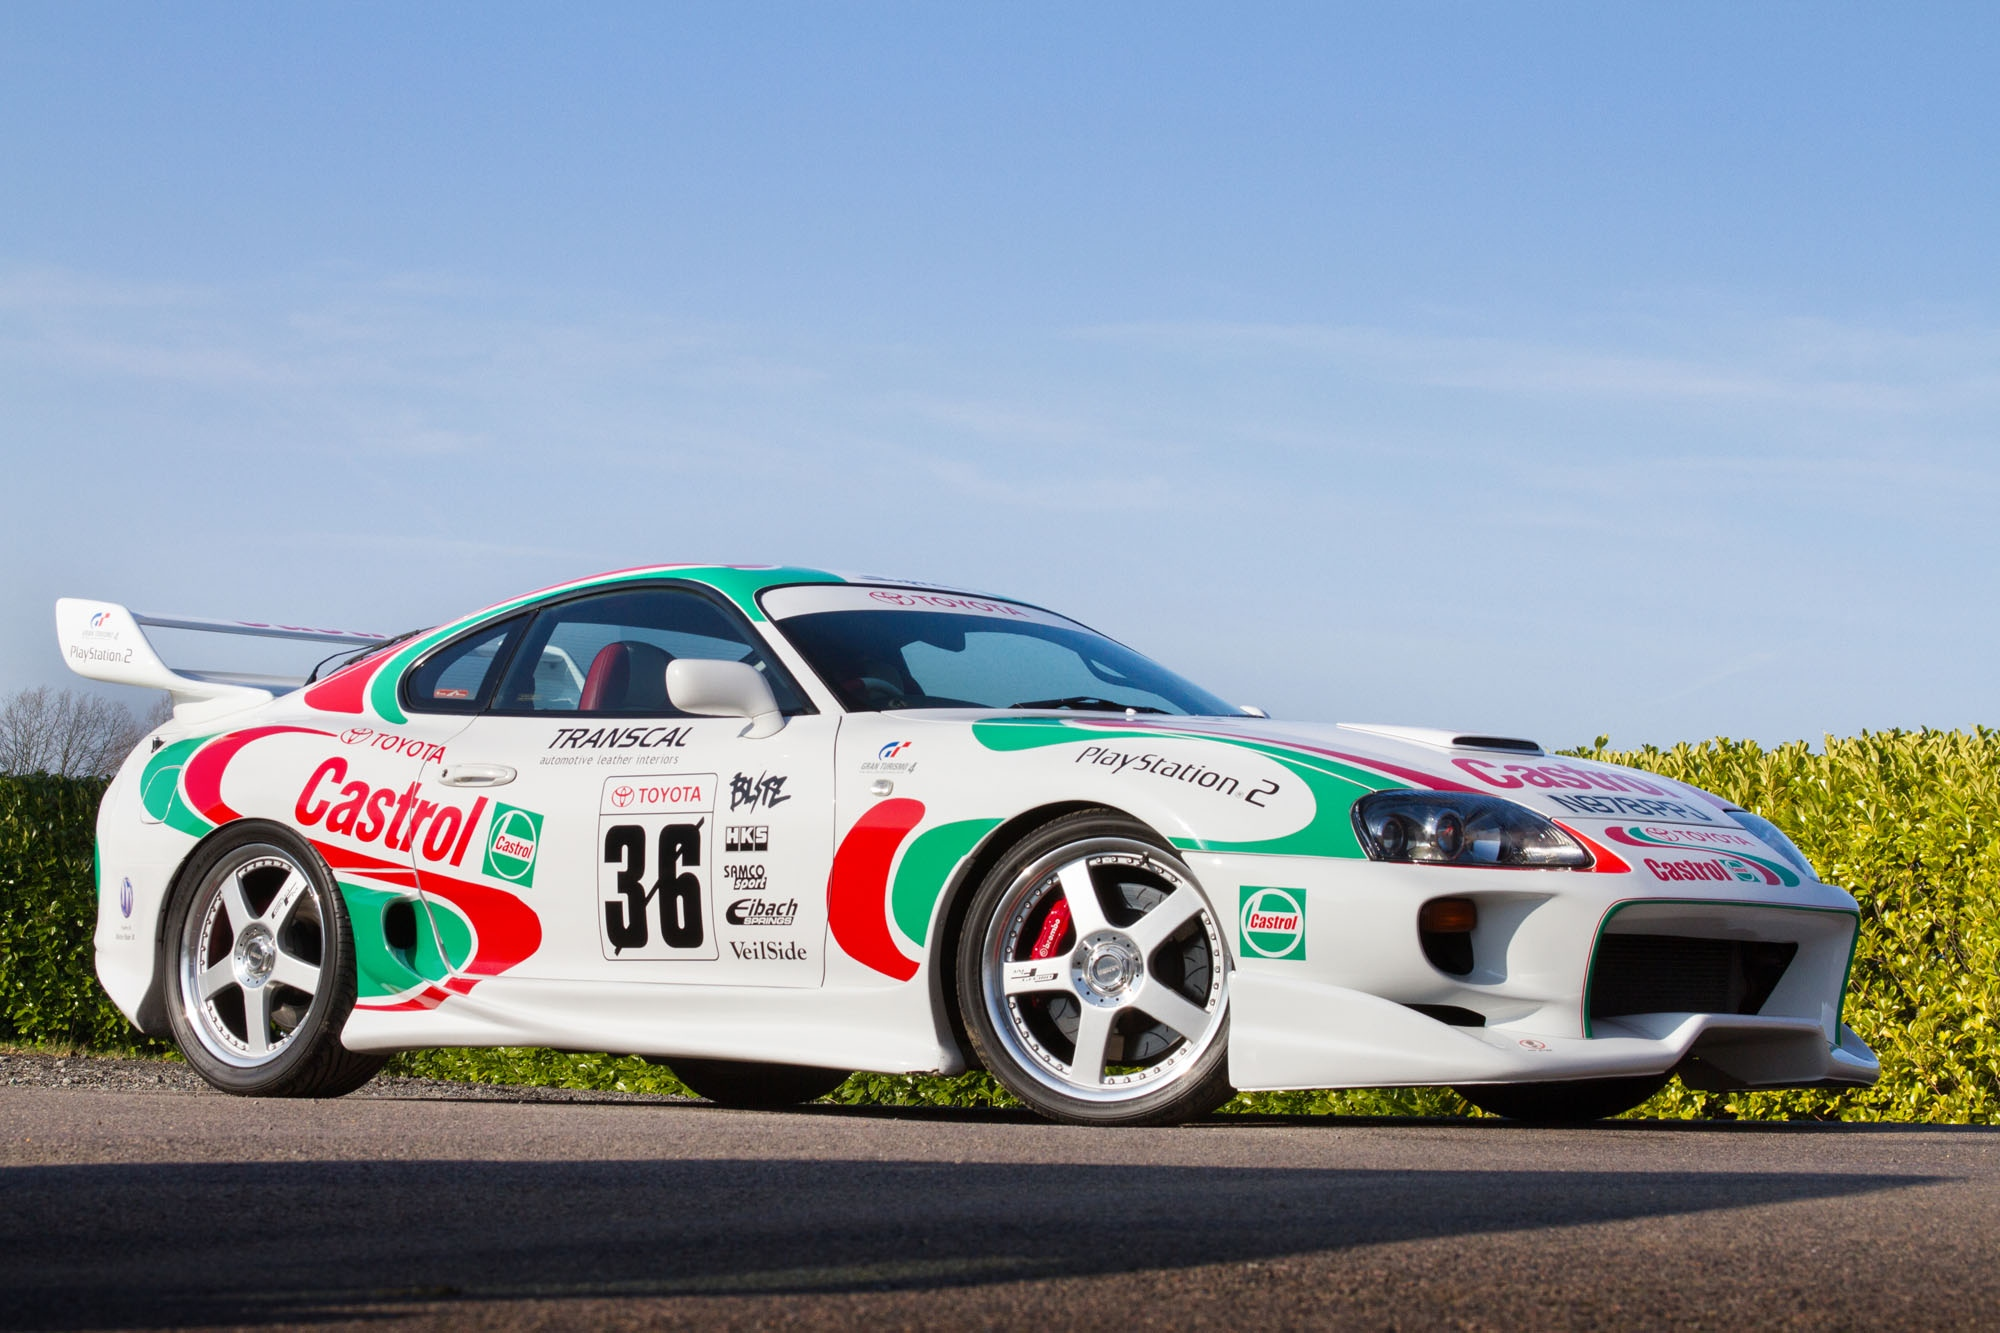 Kelebihan Kekurangan Toyota Supra 1996 Spesifikasi